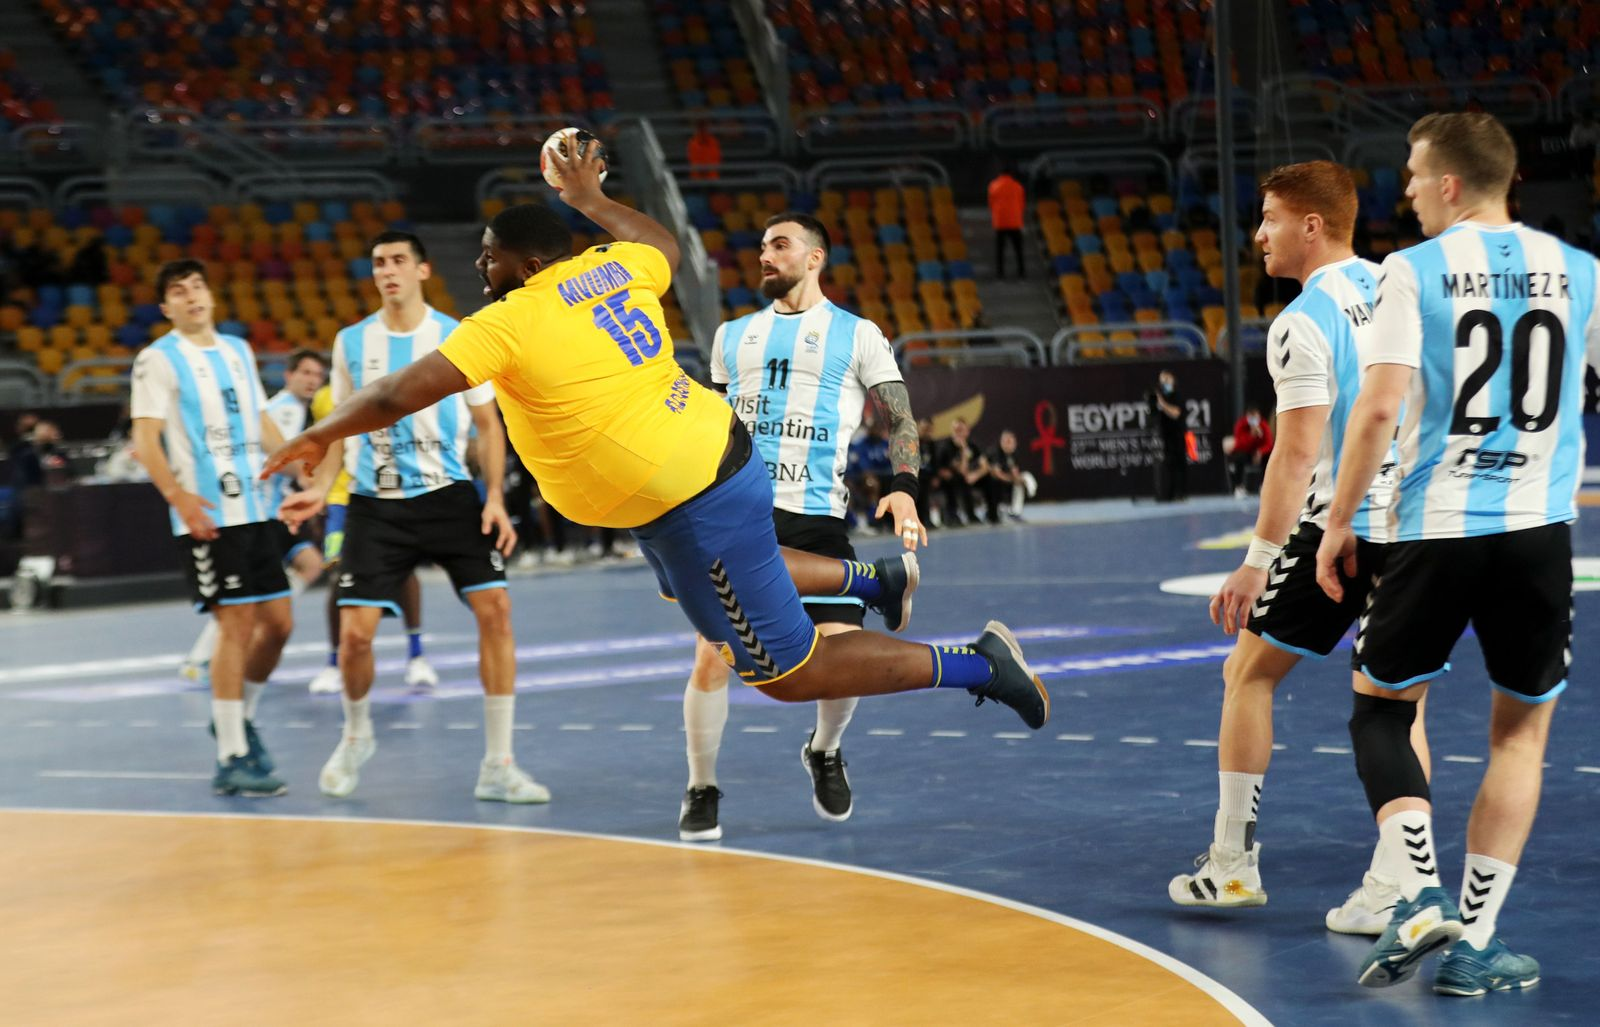 Men Handball World Championship 2021, Cairo, Egypt - 15 Jan 2021